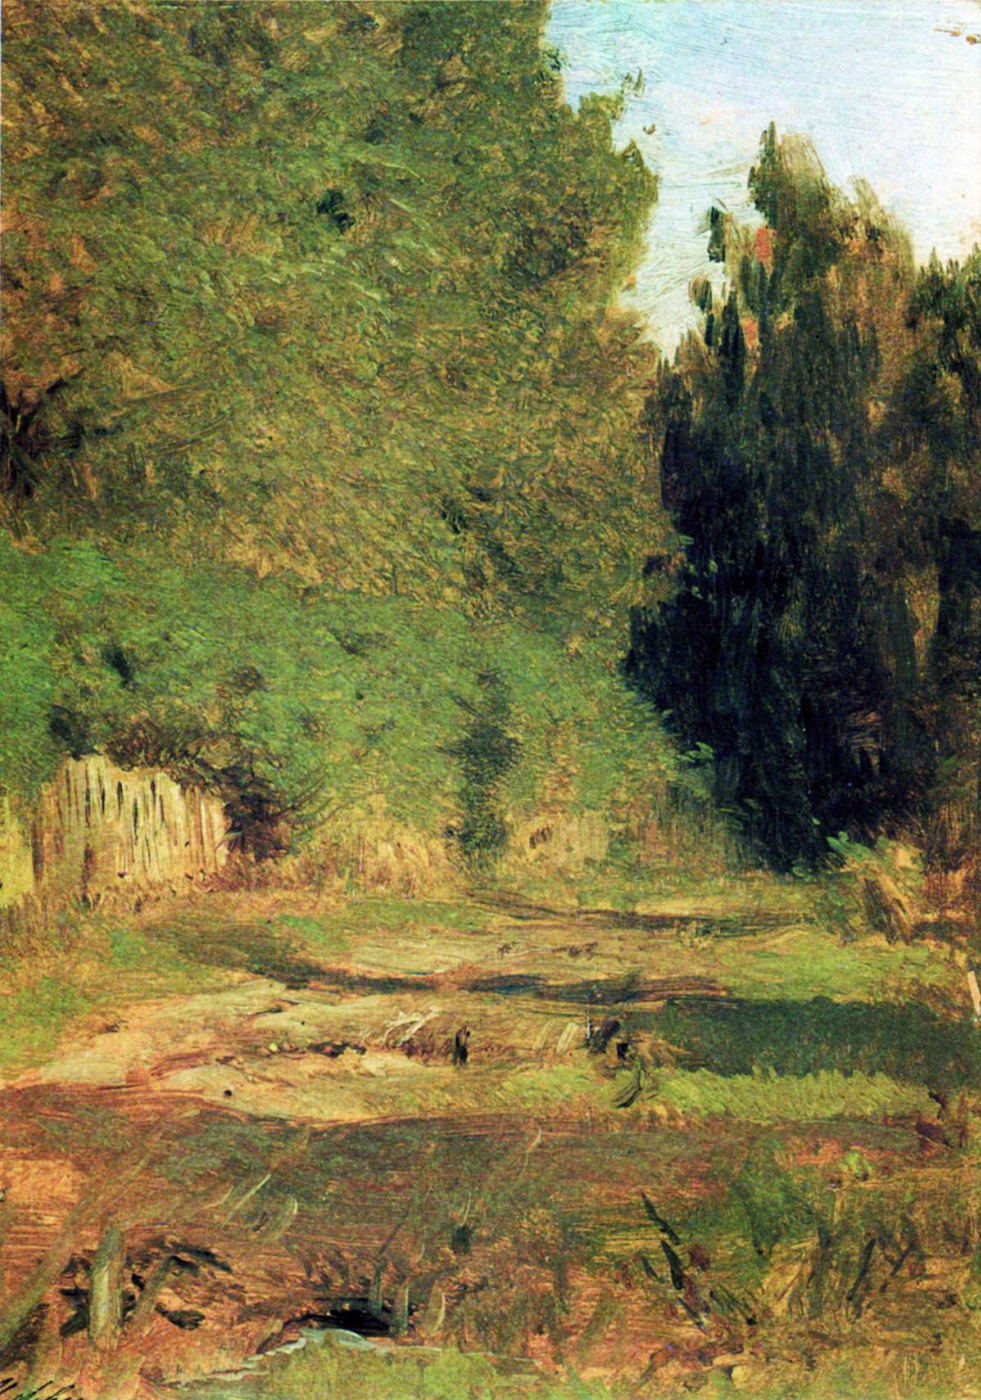 Isaac Levitan. At the grove